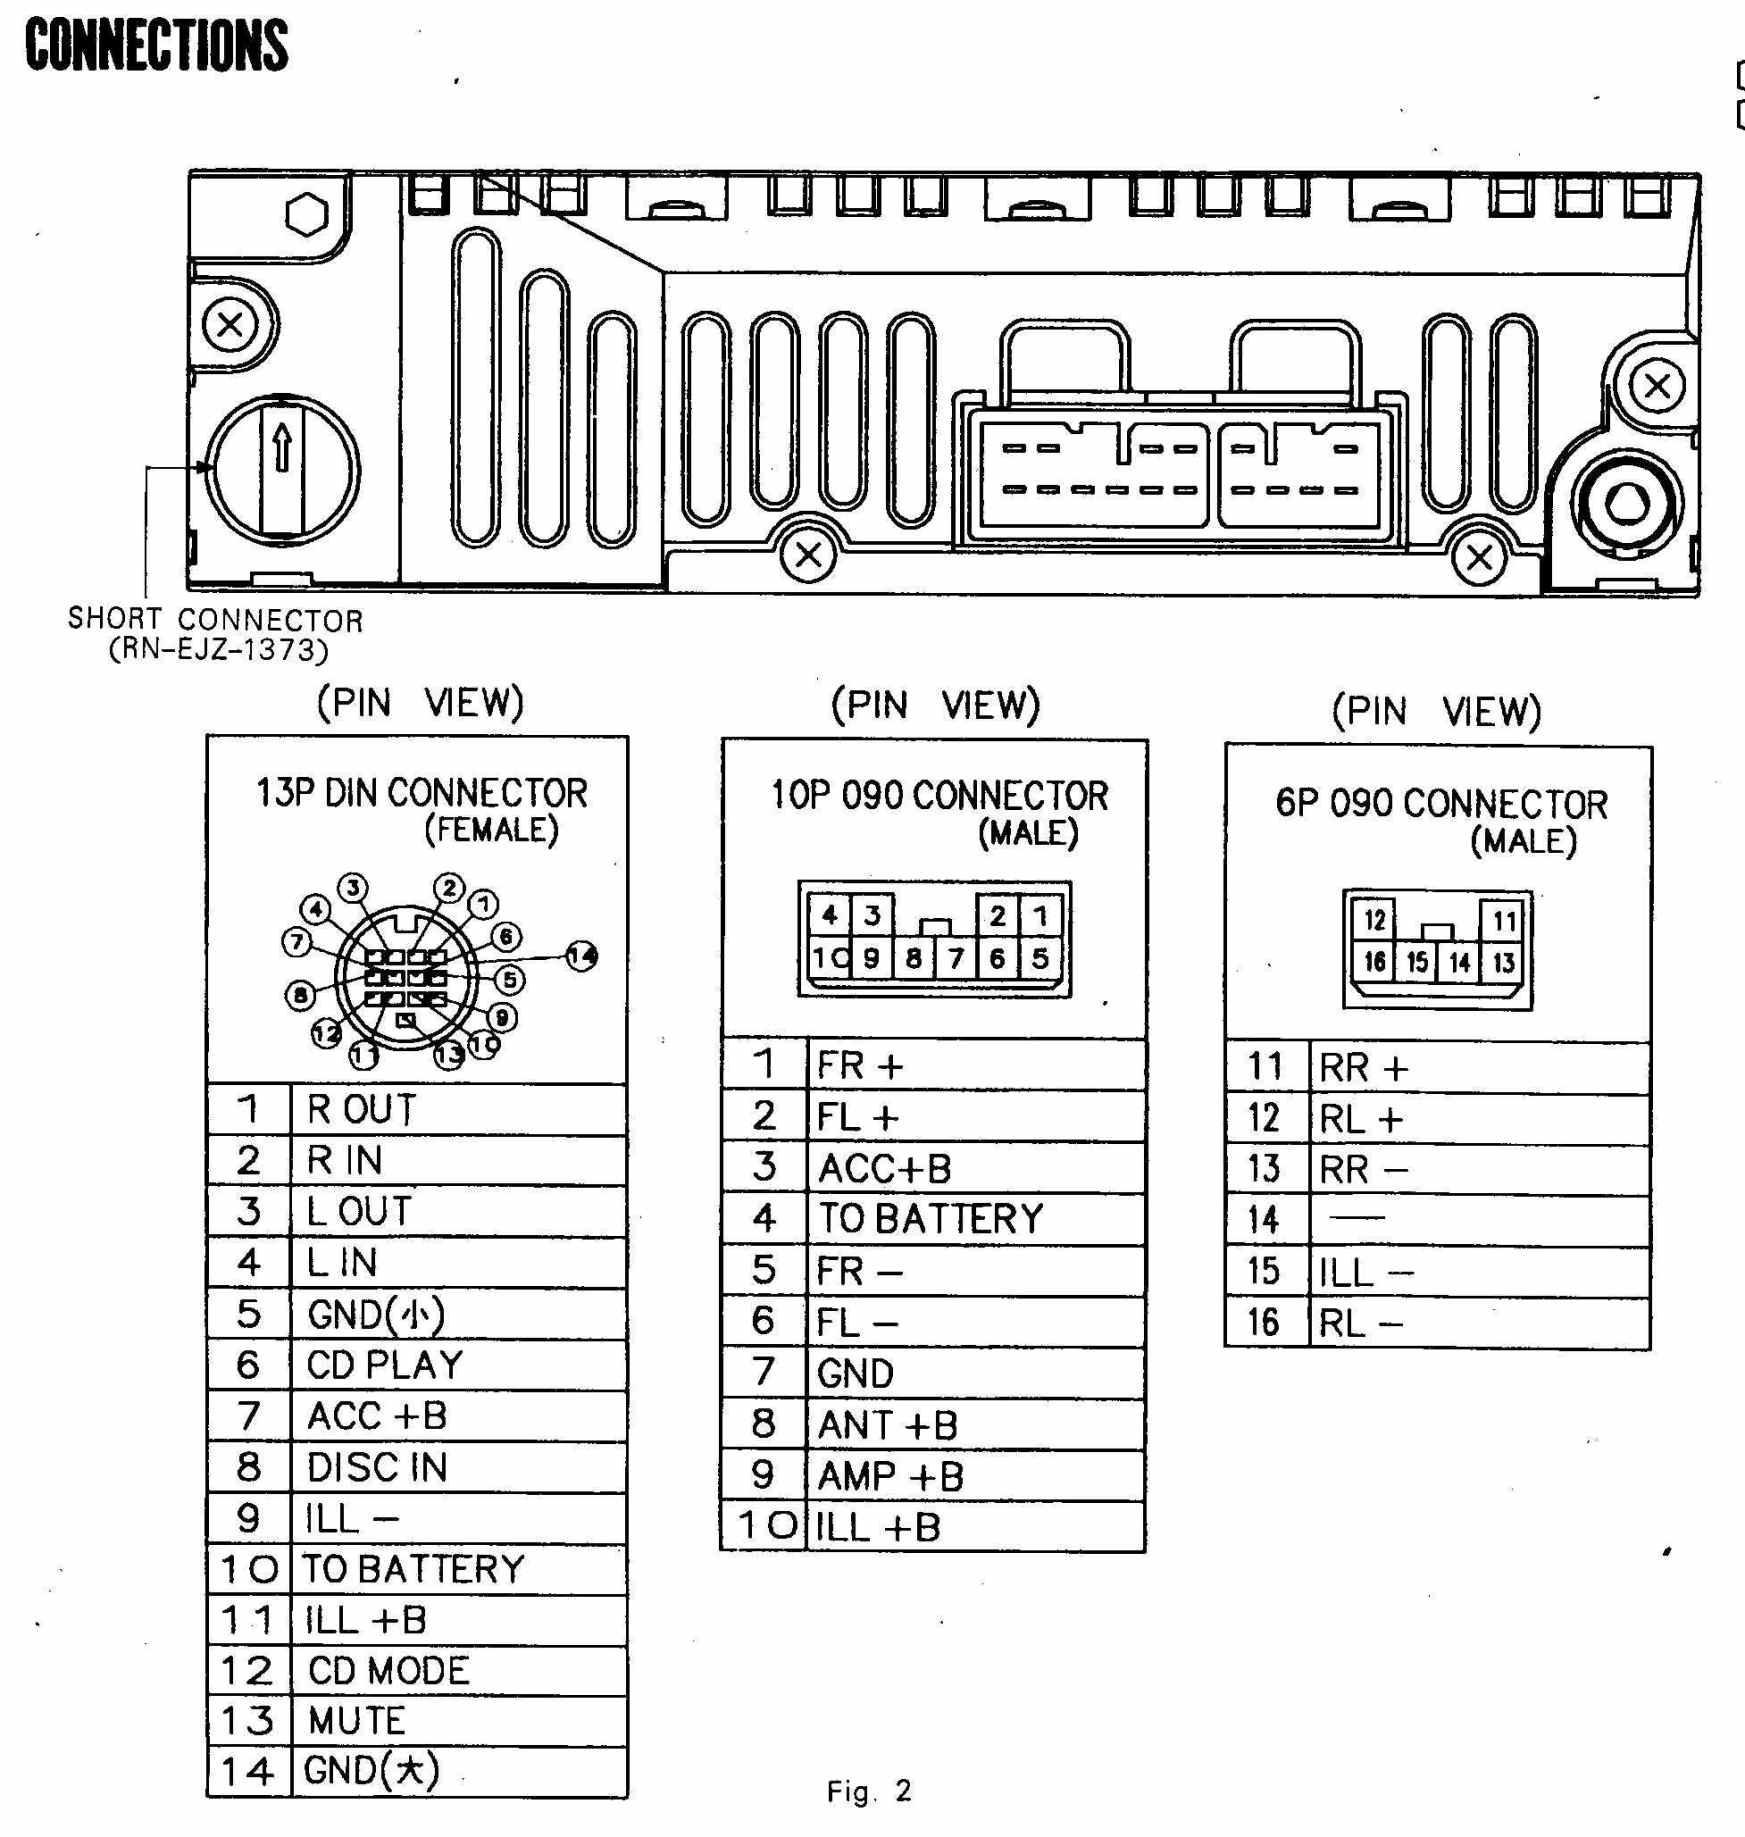 hight resolution of kenwood radio wiring diagram kenwood kdc248u wiring diagram kdc 248u instructions schematic car of kenwood radio